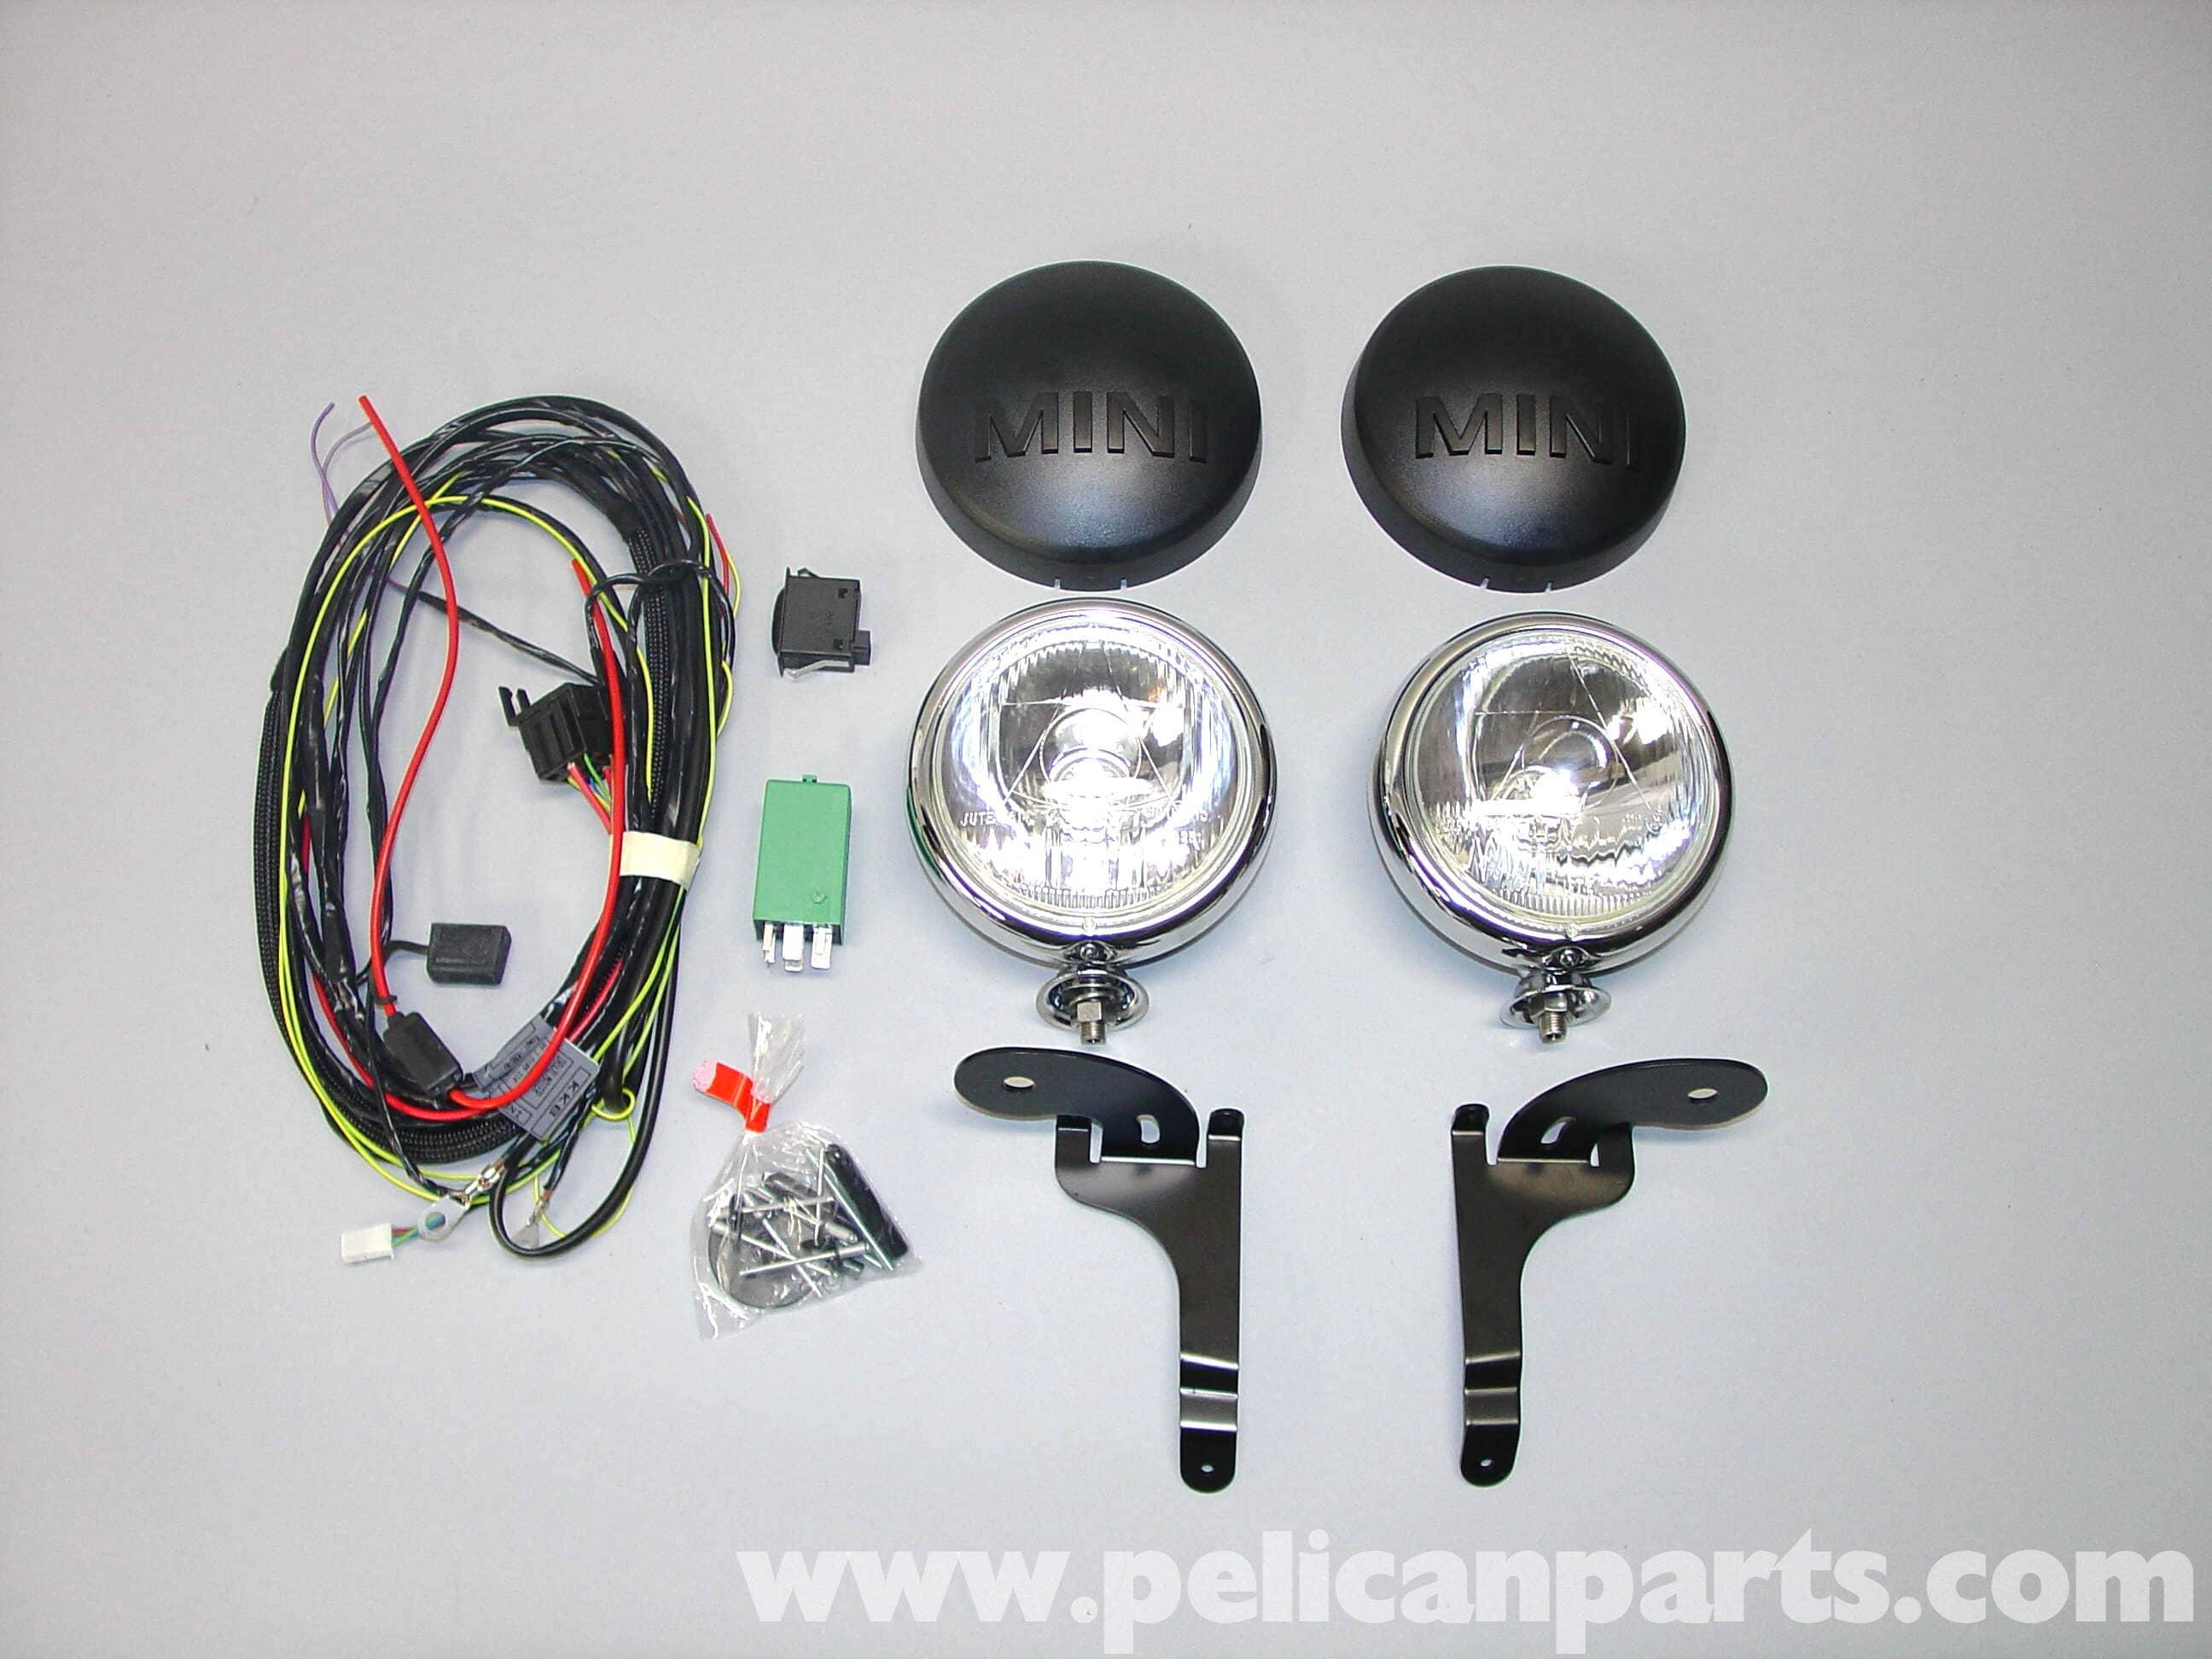 Extra Headlights Wiring Diagrams Mini Cooper Headlight Diagram Driving Light Installation R50 R52 R53 2001 Basic 3 Wire